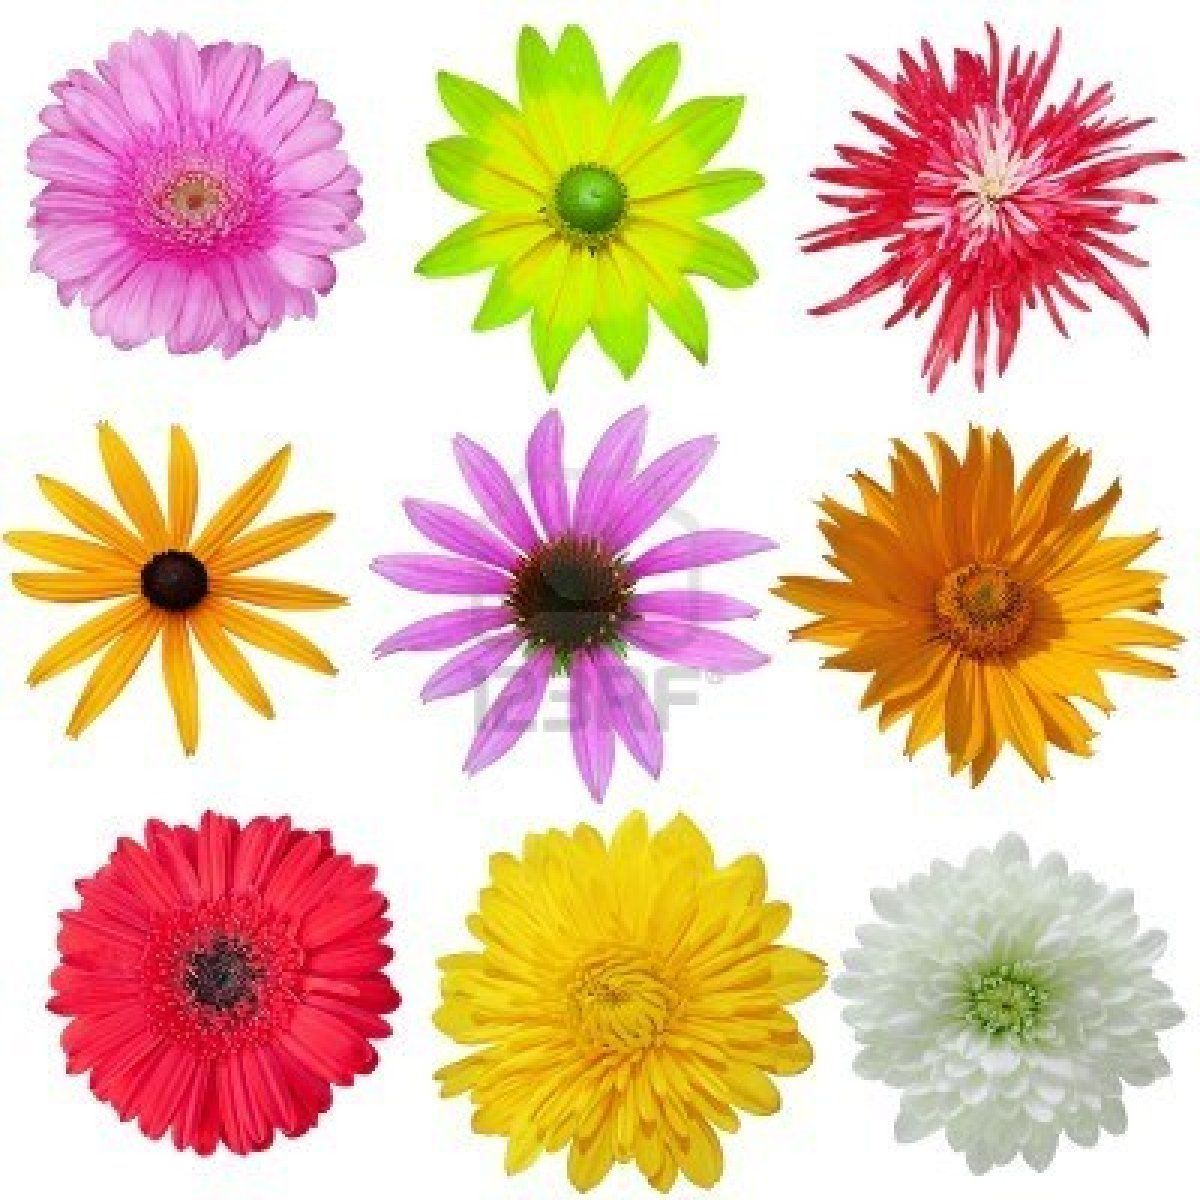 Wild Daisy Flowers Daisies Pinterest Daisy Flowers